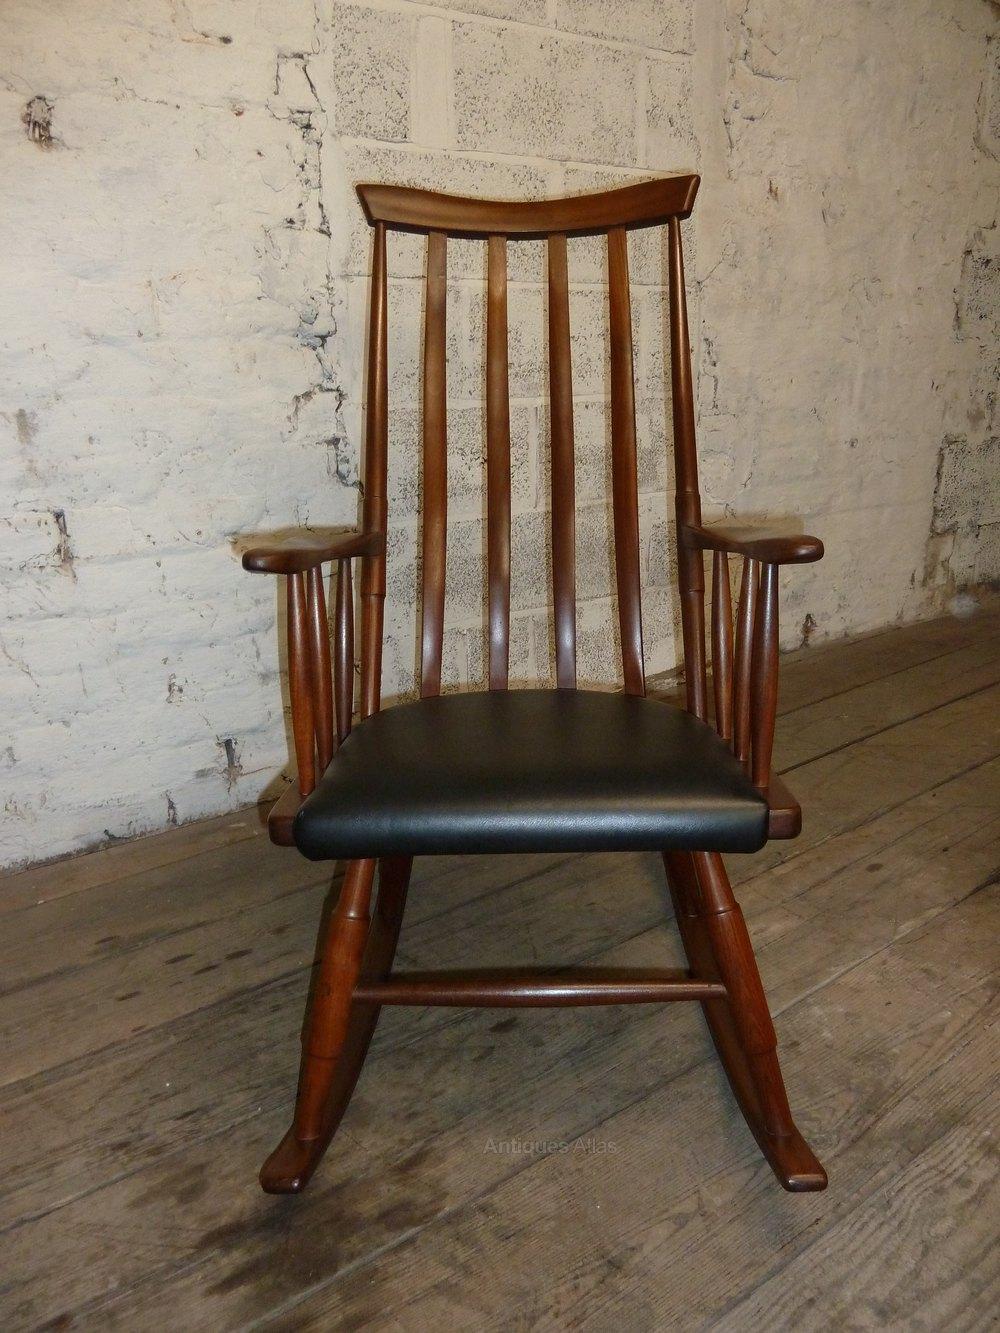 Antiques Atlas Danish Teak Vintage Retro Rocking Chair